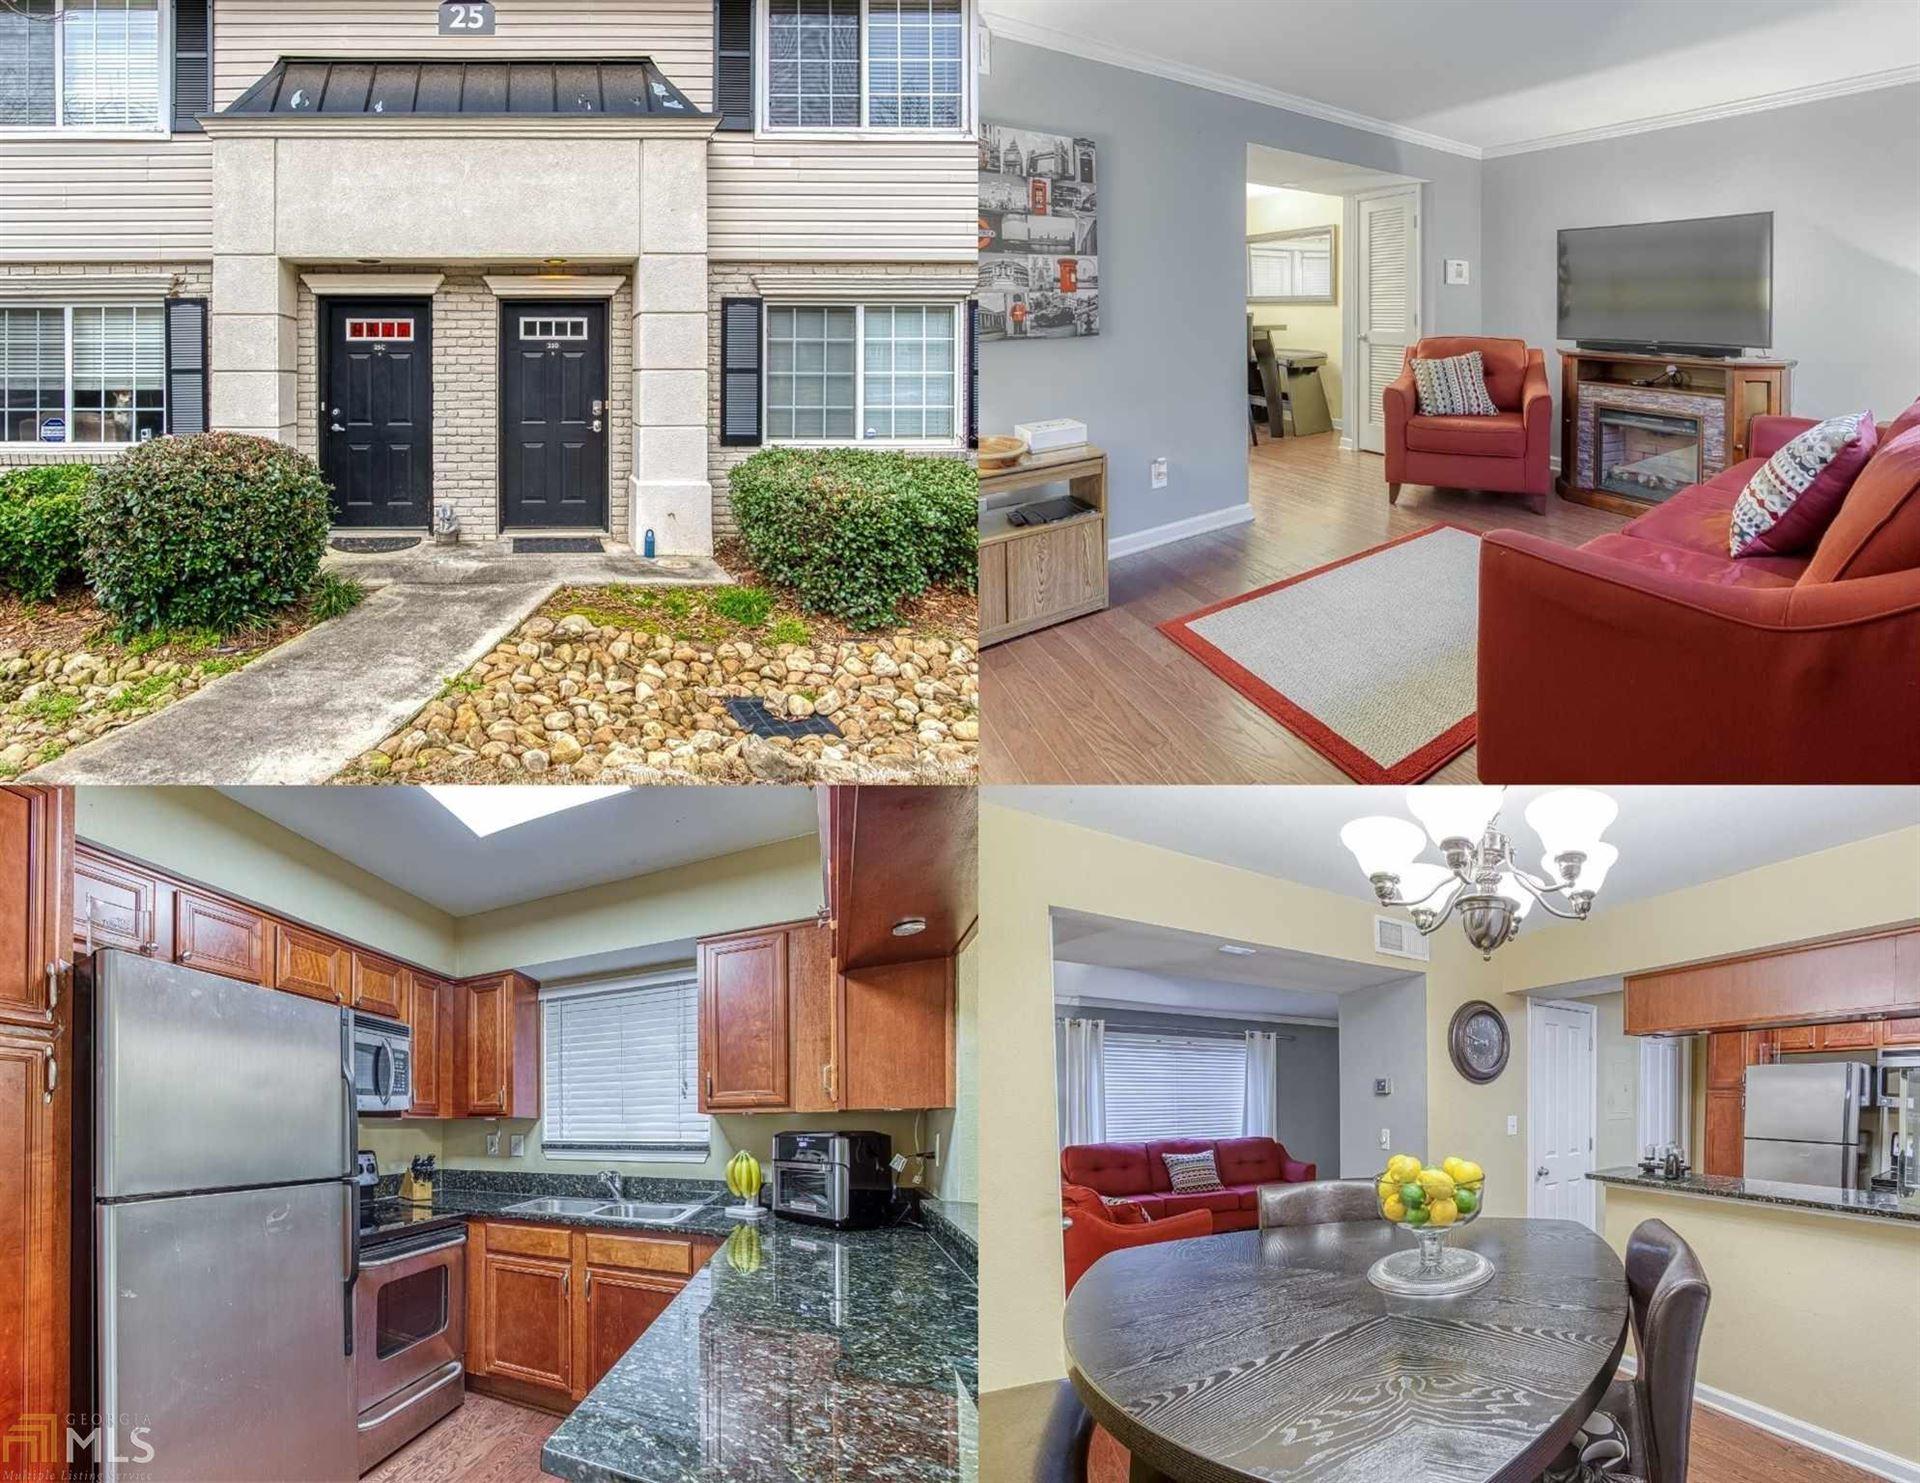 6940 Roswell Rd, Atlanta, GA 30328 - MLS#: 8909814